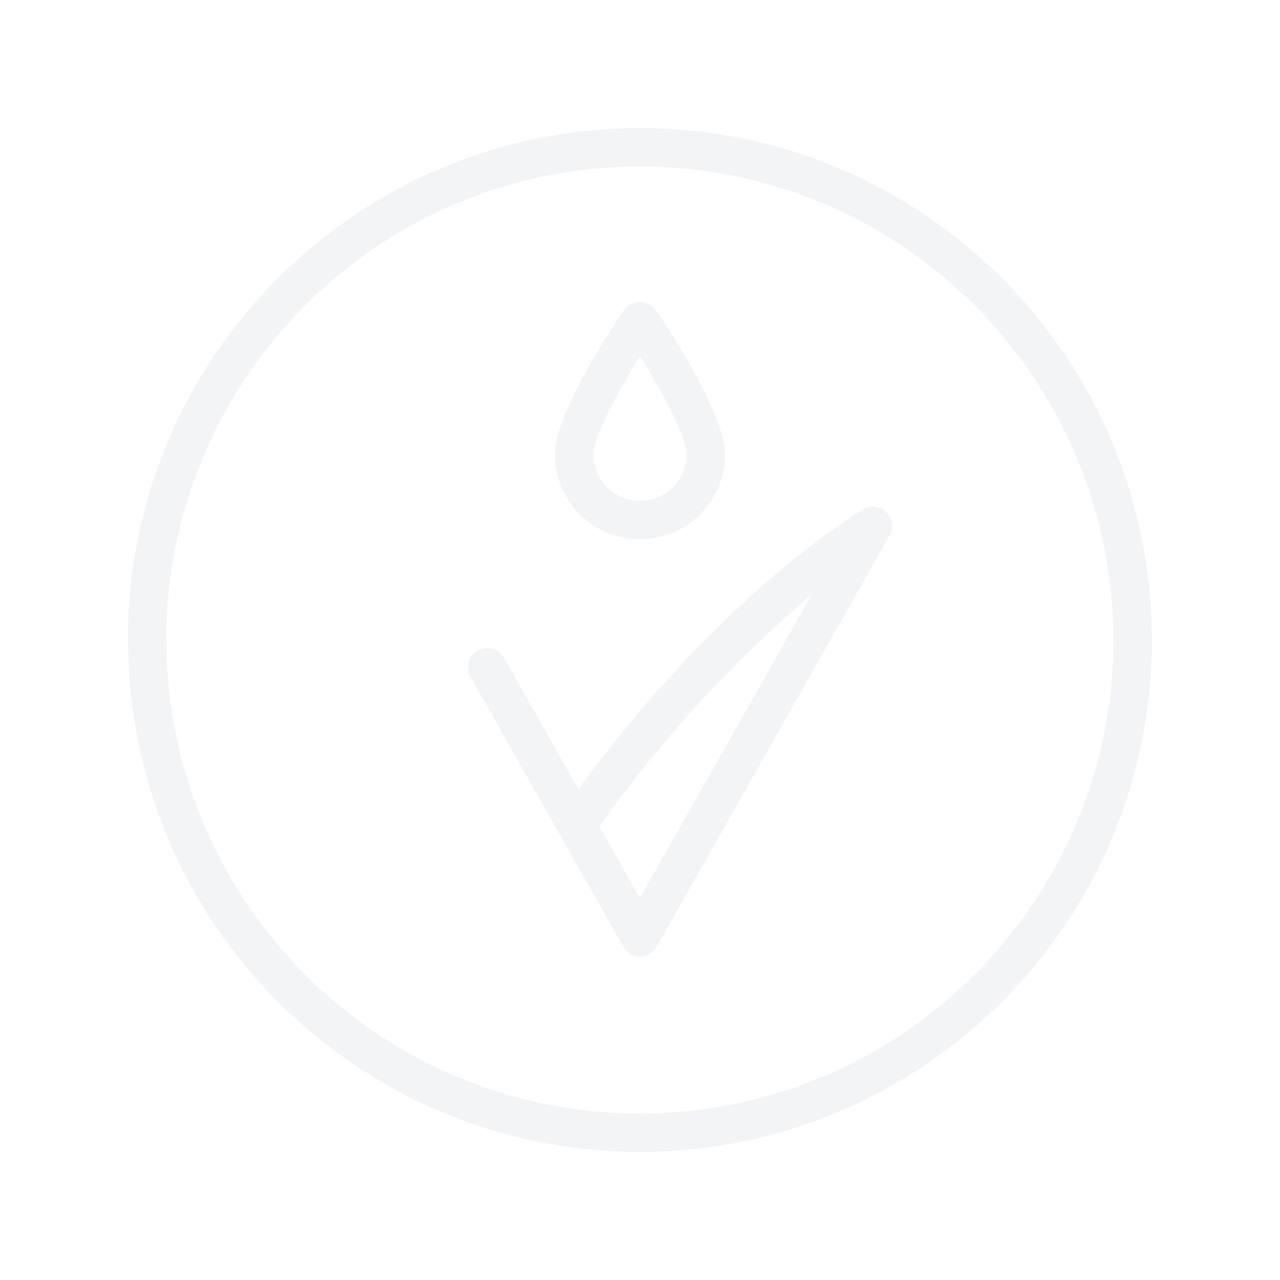 Shiseido Advanced Hydro-Liquid Compact Refill Foundation SPF10 12g